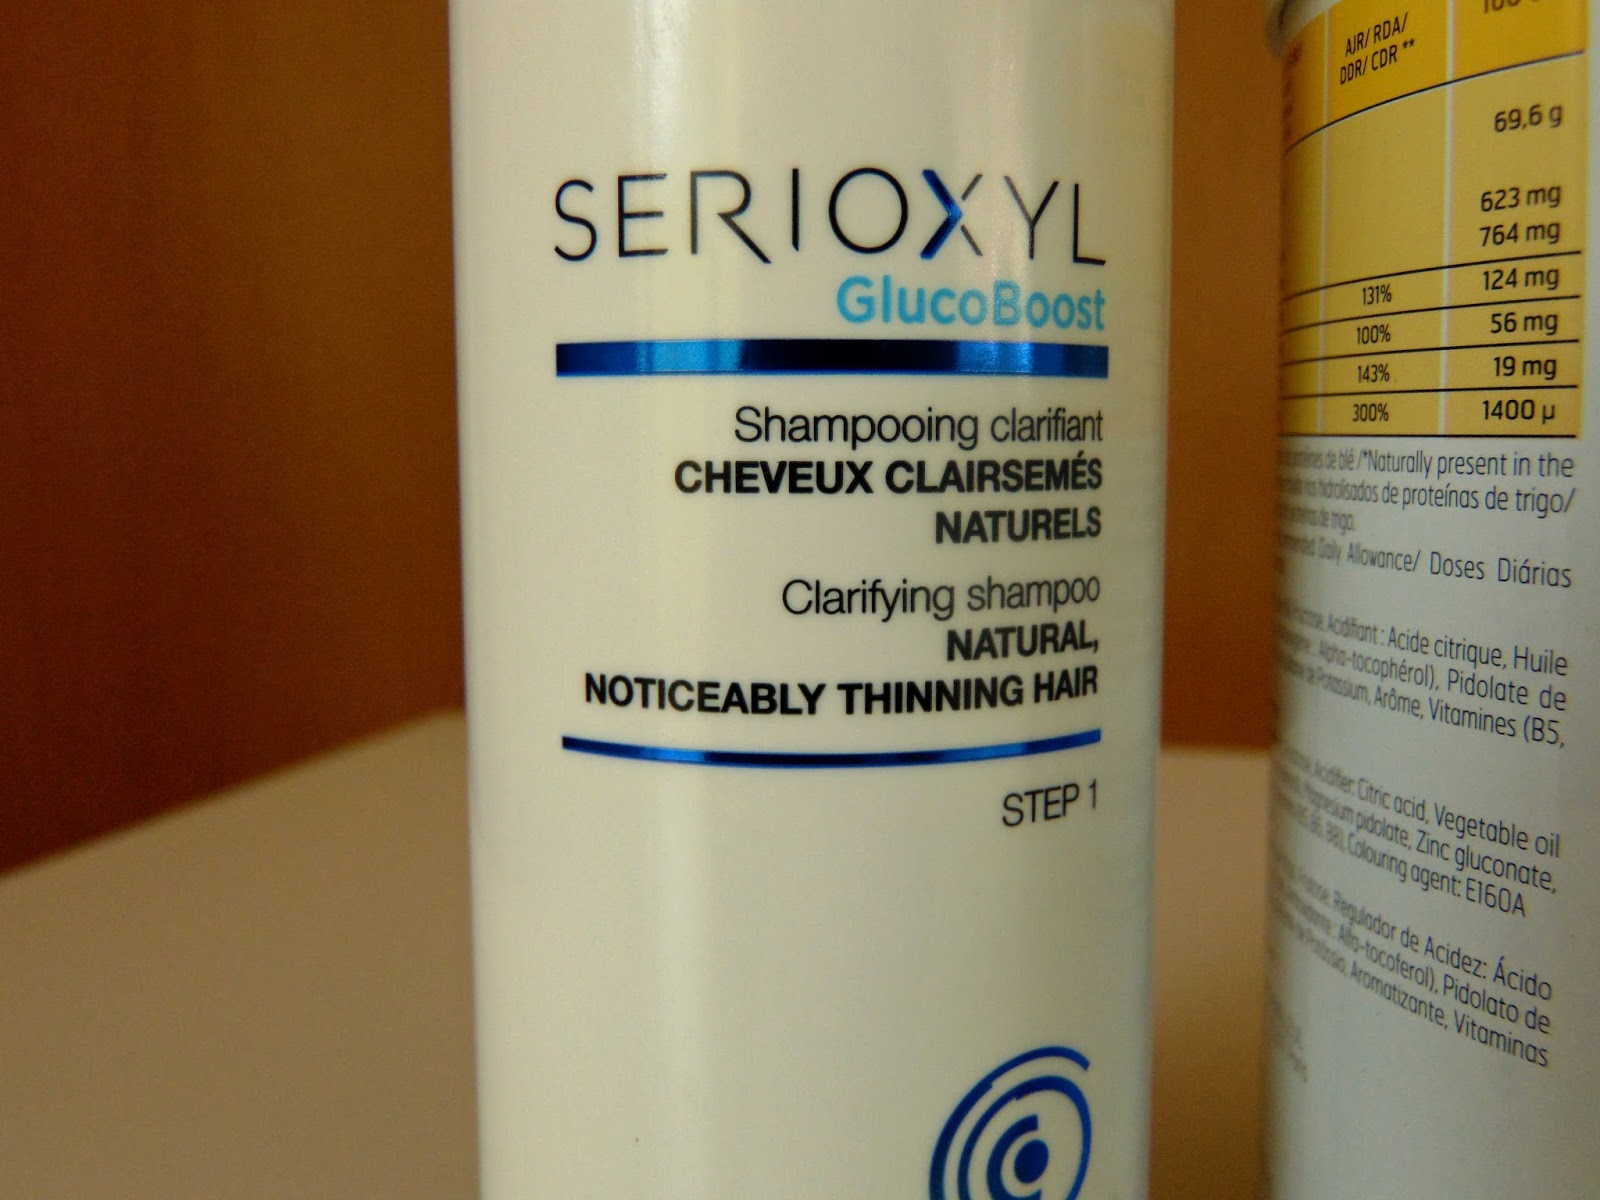 l'oreal-profissionel-serioxyl-glucoboost-cabelo-queda